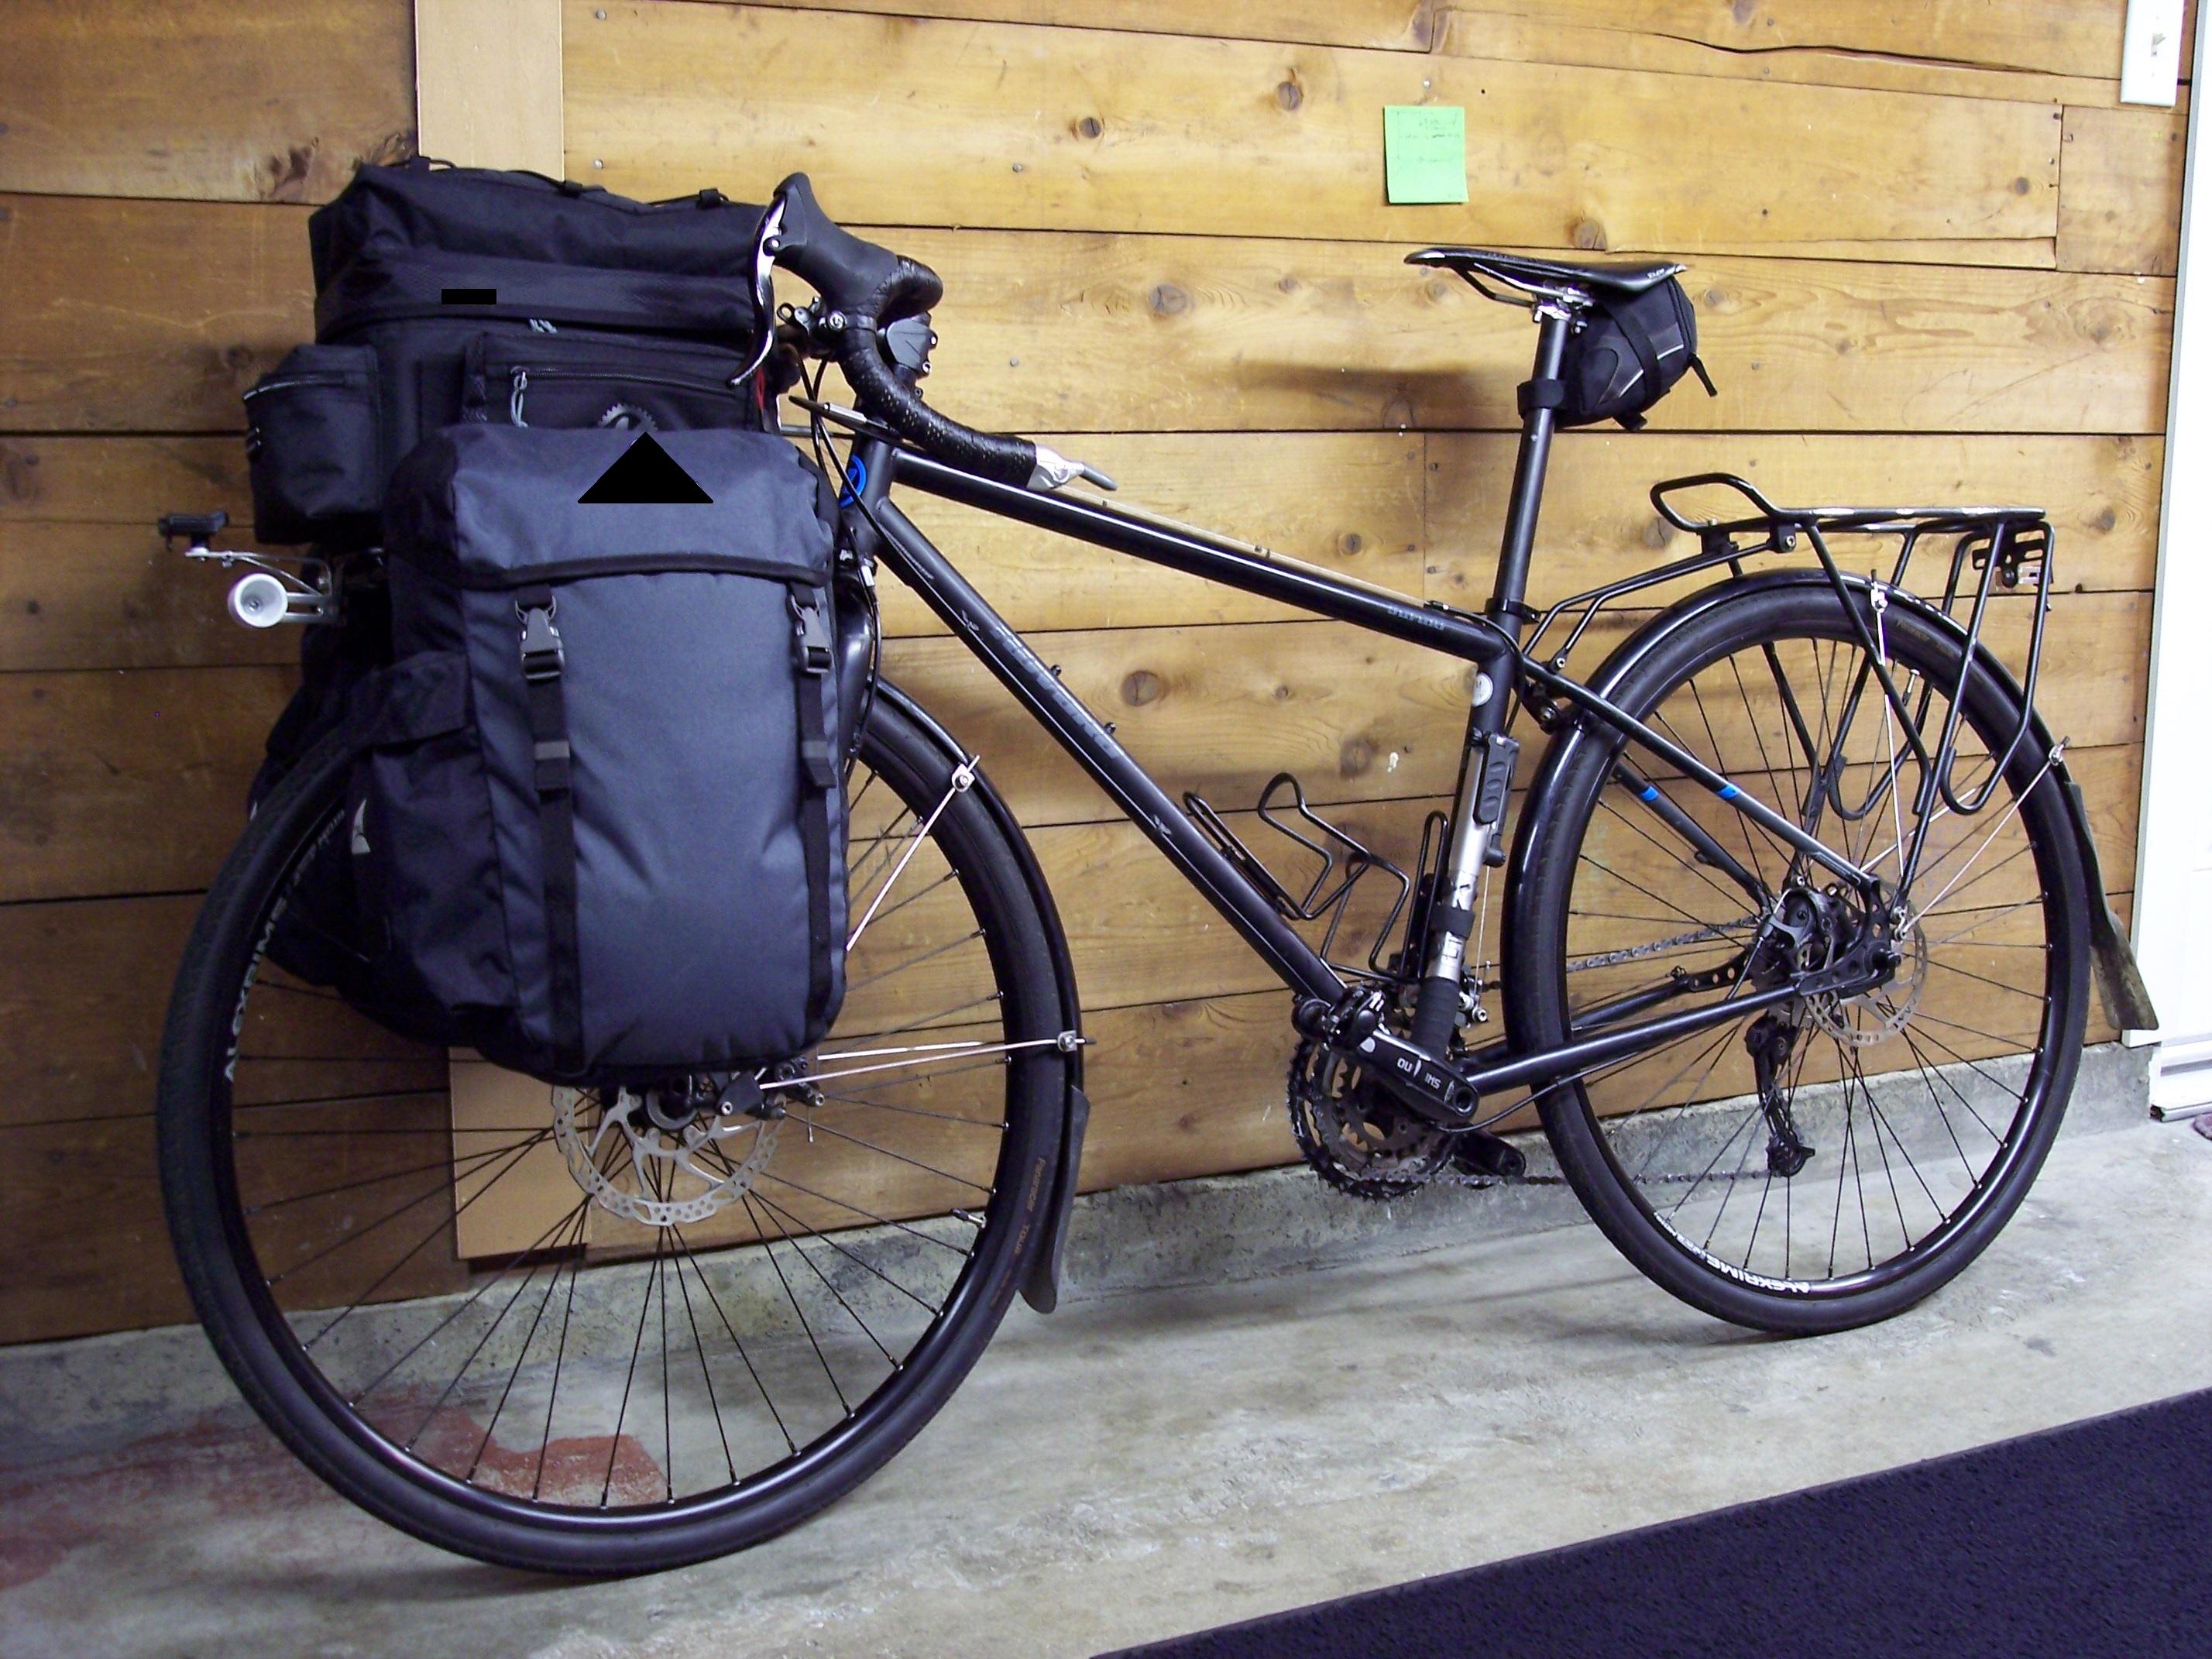 Eric Abbott - Commuter bike set up